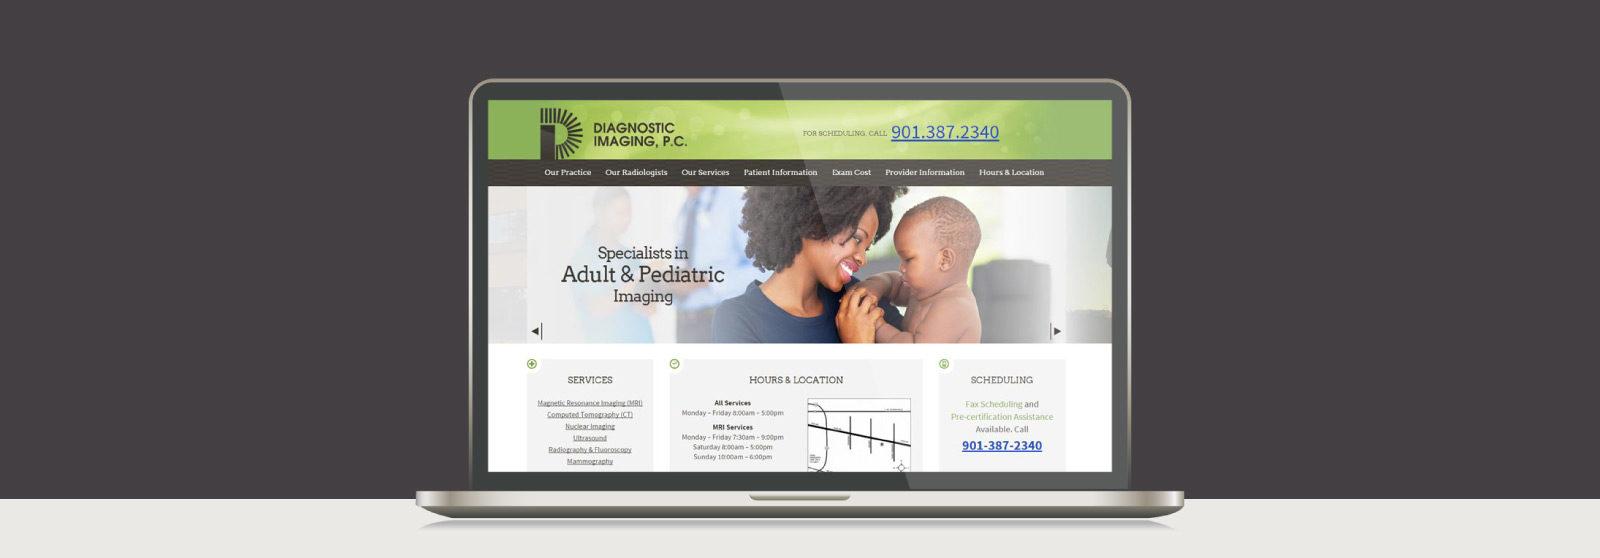 Diagnostic Imaging Website